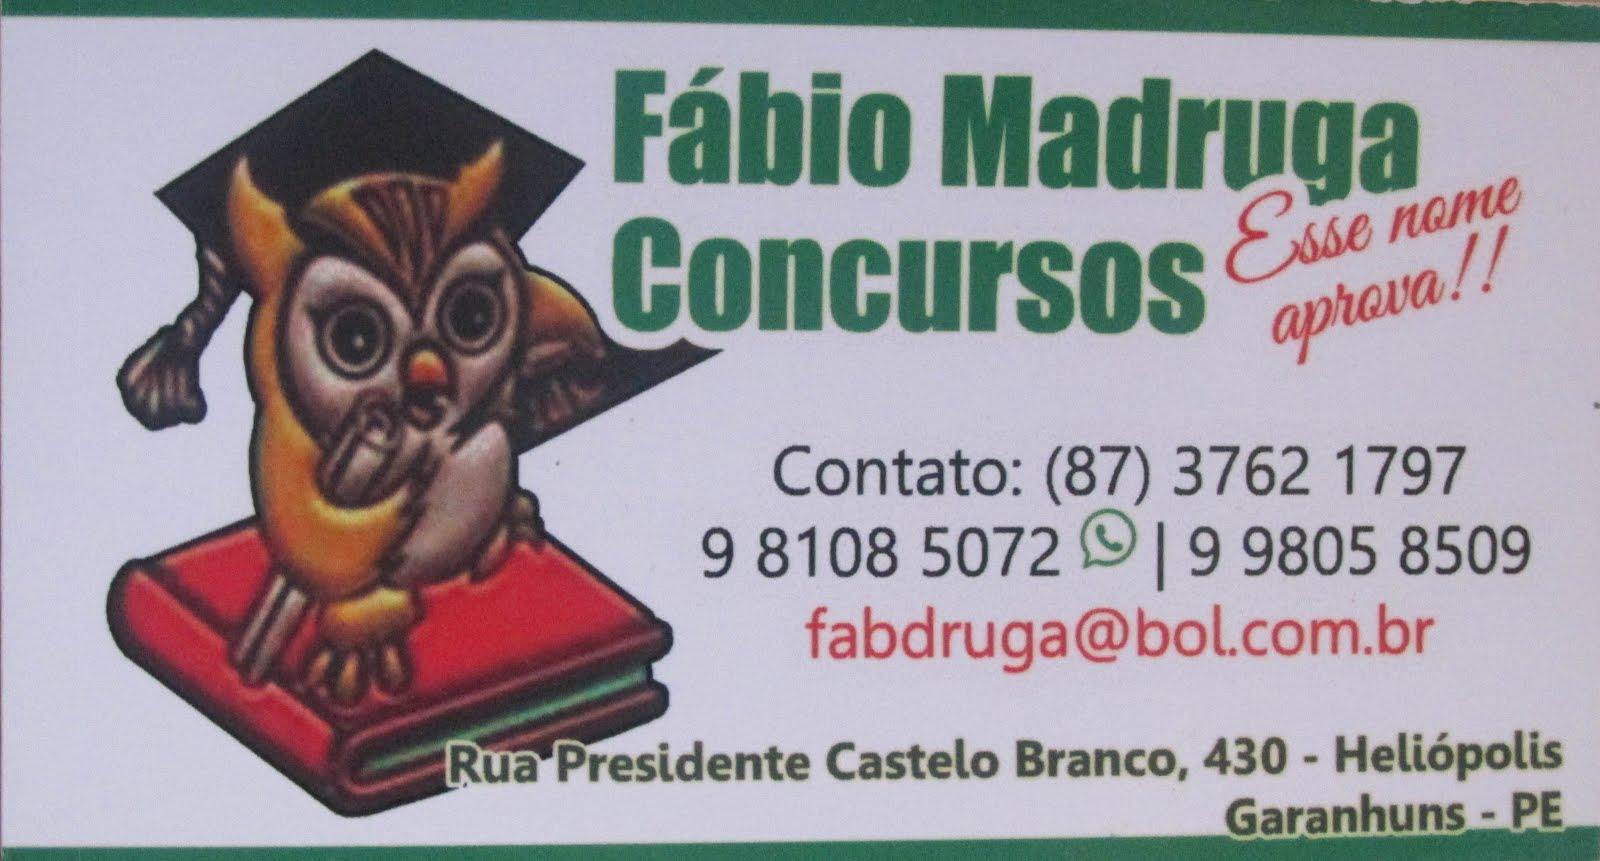 FÁBIO MADRUGA CONCURSOS